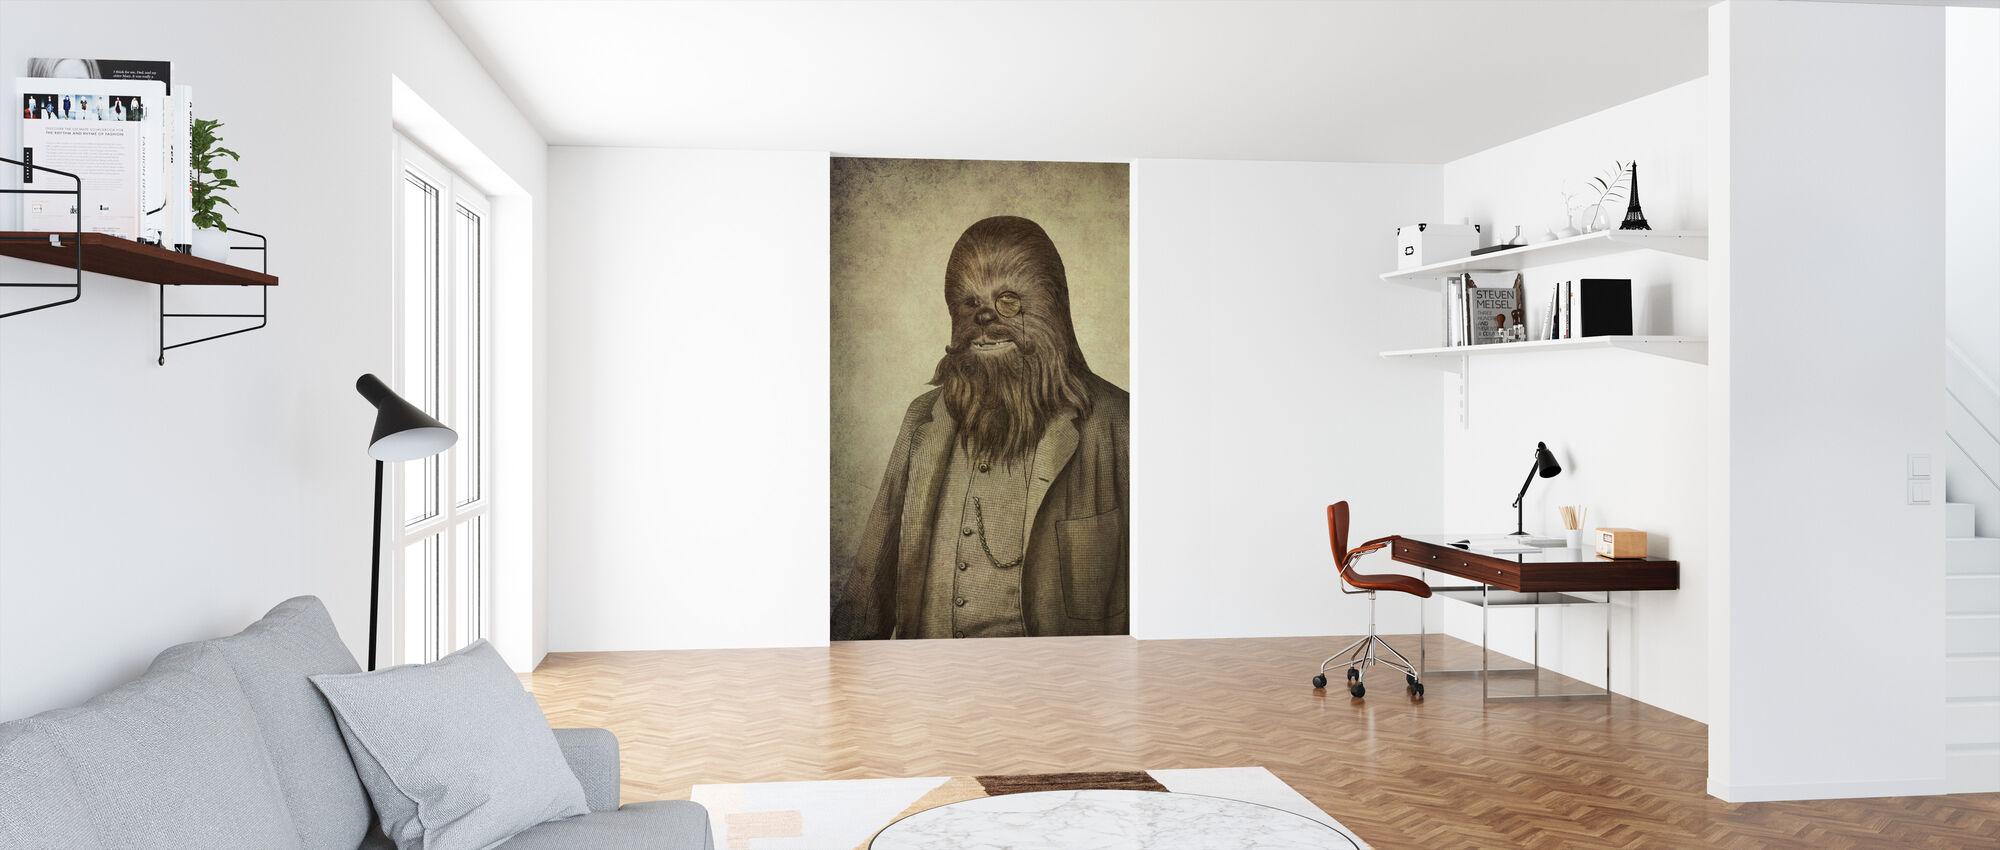 Victorian Wars Chancellor Chewman - Wallpaper - Office